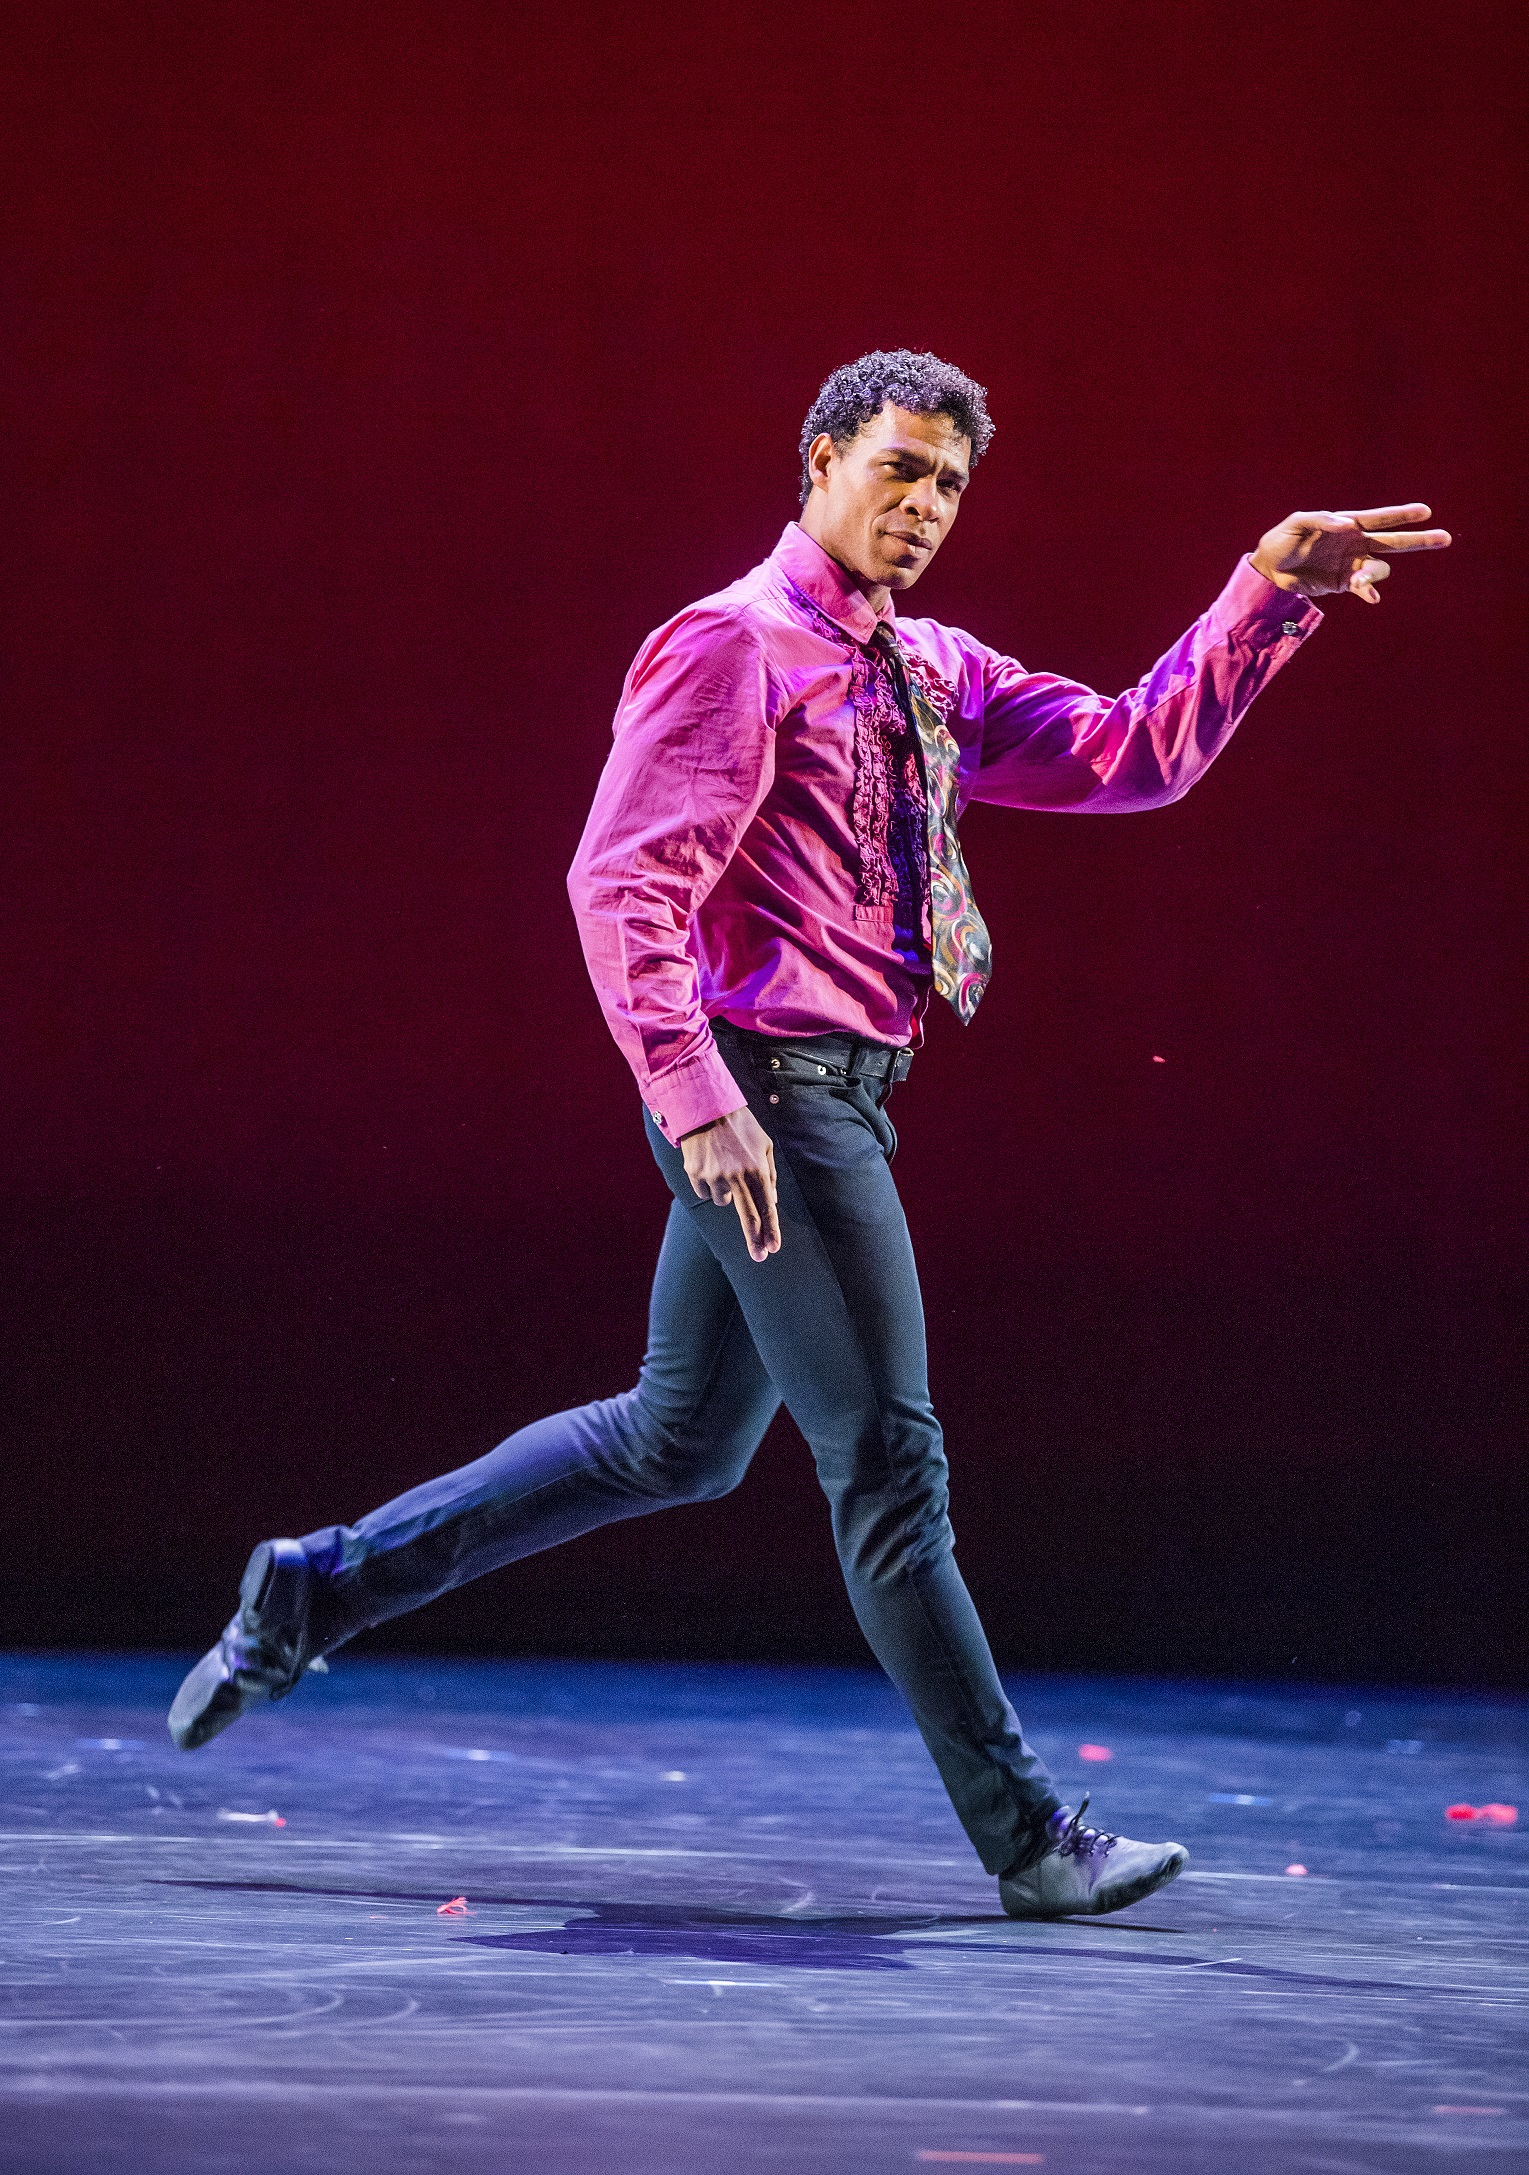 3 Carlos Acosta - A Celebration at the Royal Albert Hall 2 to 5 October 2018 Credit Tristram Kenton